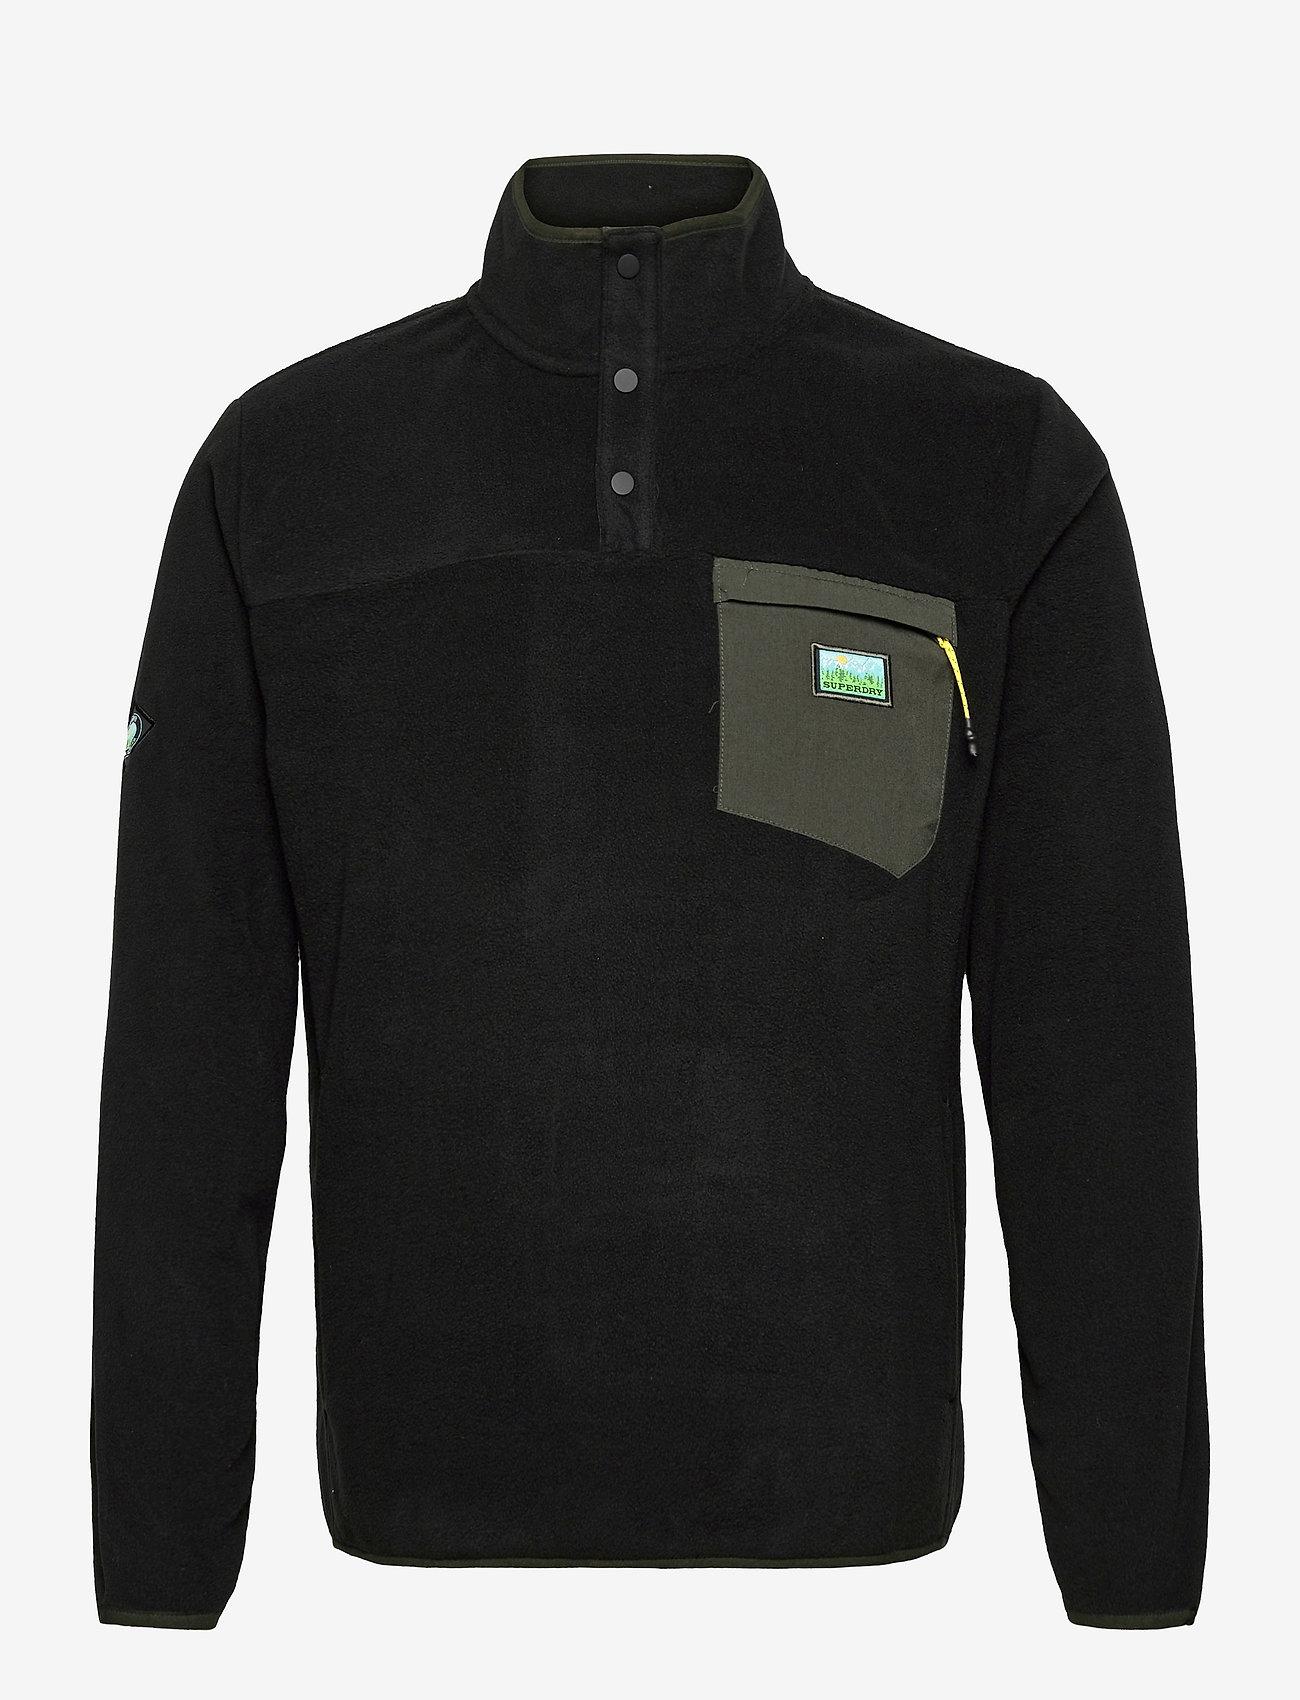 Superdry - B TRAIL POLAR FLEECE POP OVER - basic-sweatshirts - black - 0